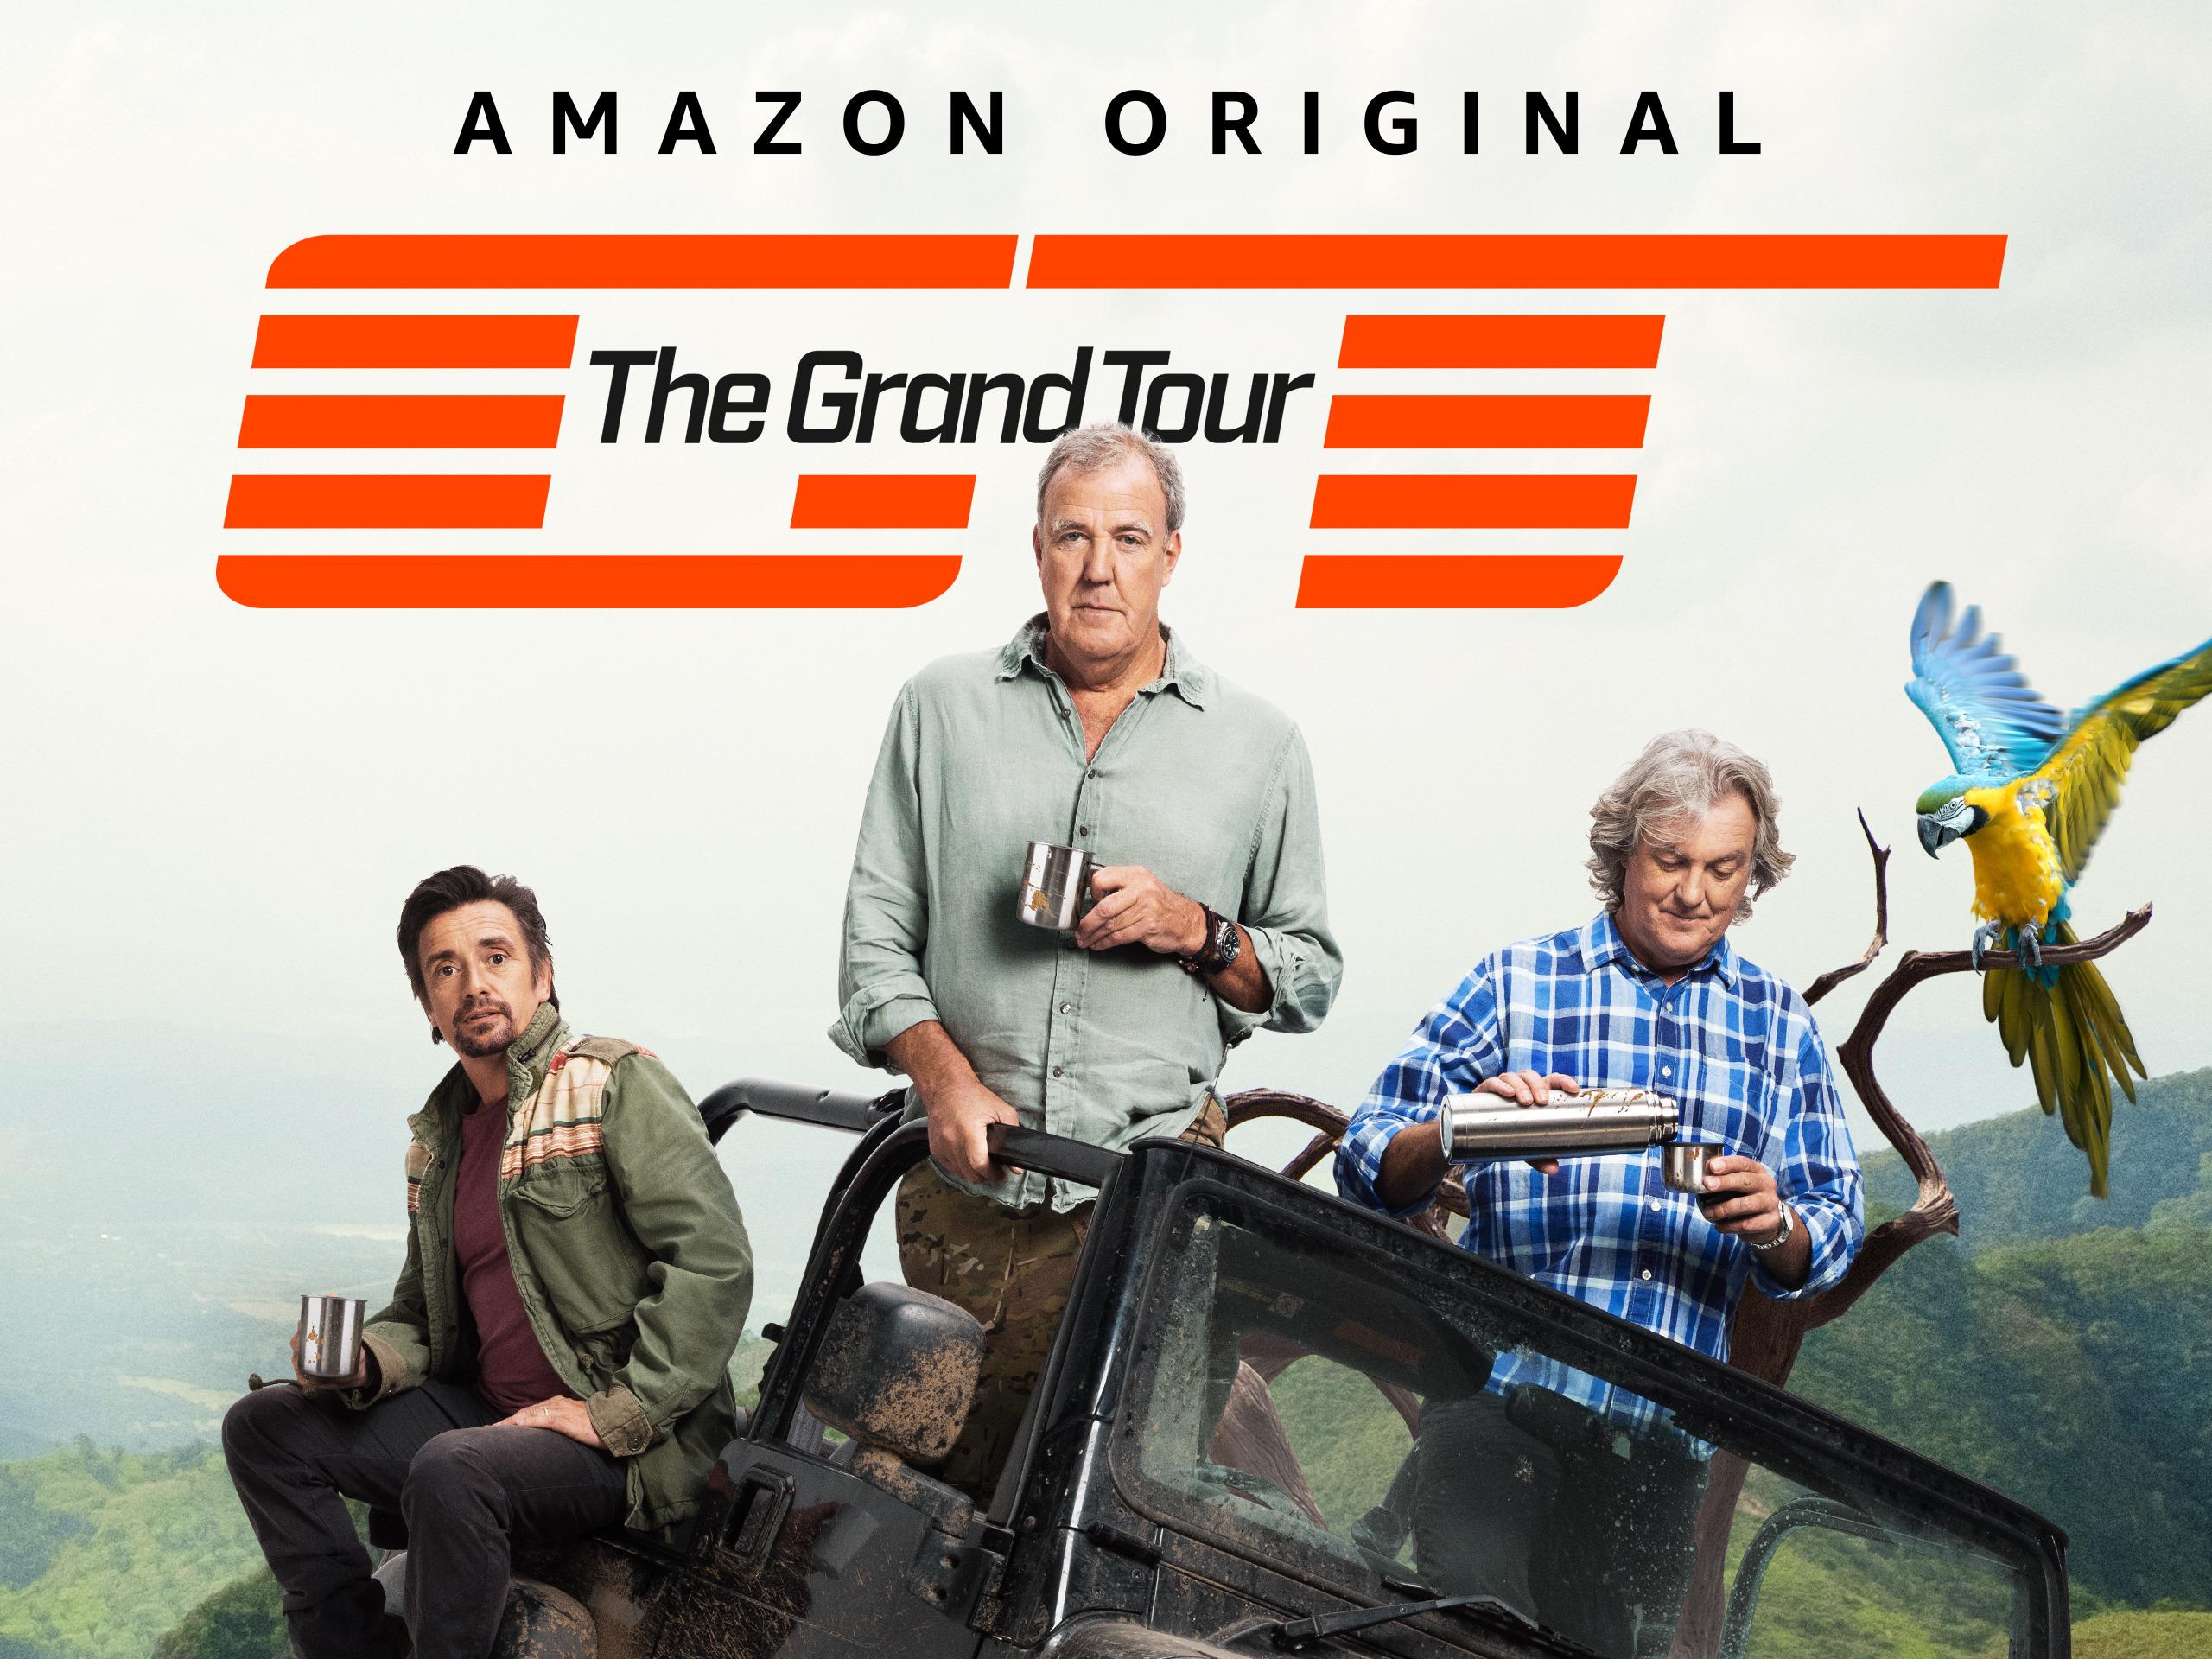 http://exposedsub.ir/دانلود-زیرنویس-فارسی-سریال-The-Grand-Tour-.html